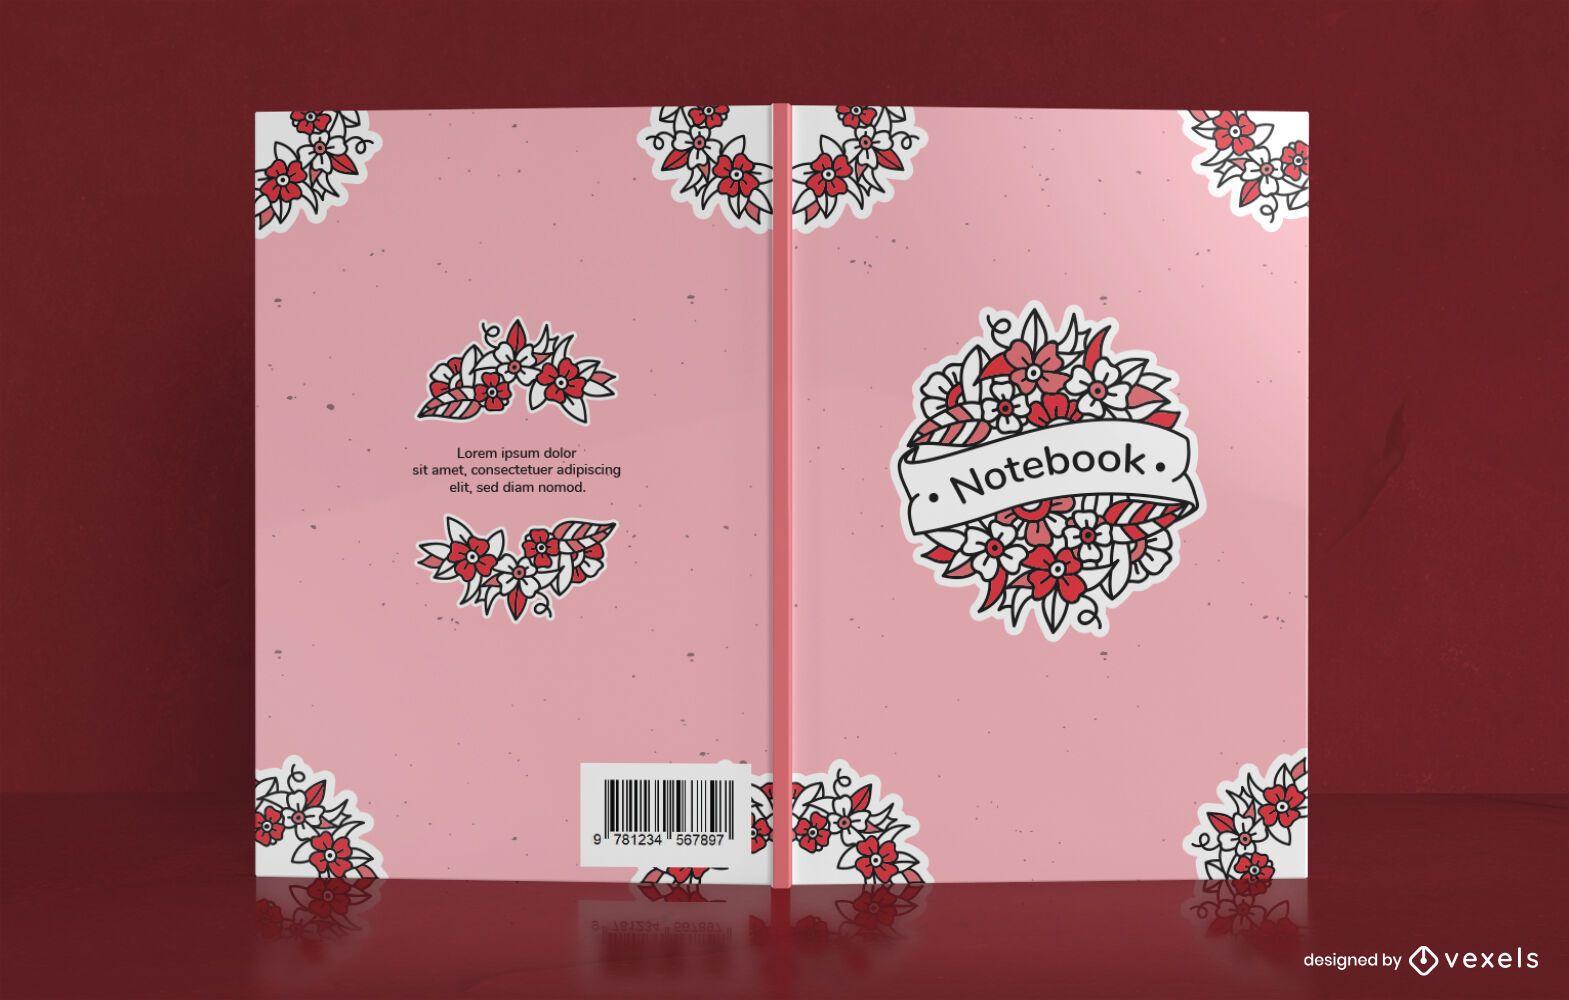 Old School Floral Notebook Cover Design